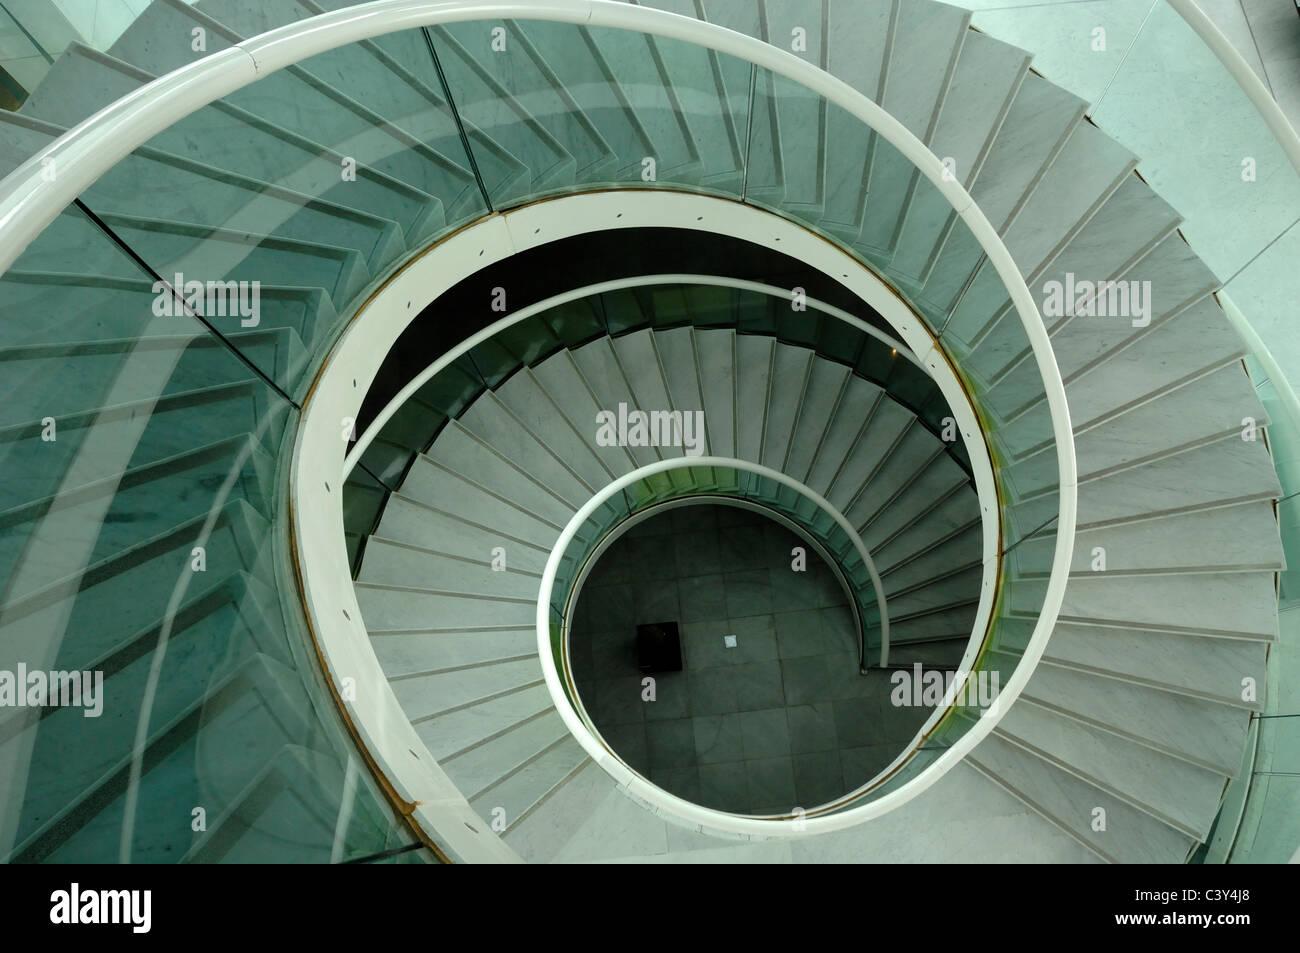 Escaleras En Espiral O Escalera Museo De Artes Asiaticas De Niza - Escaleras-en-espiral